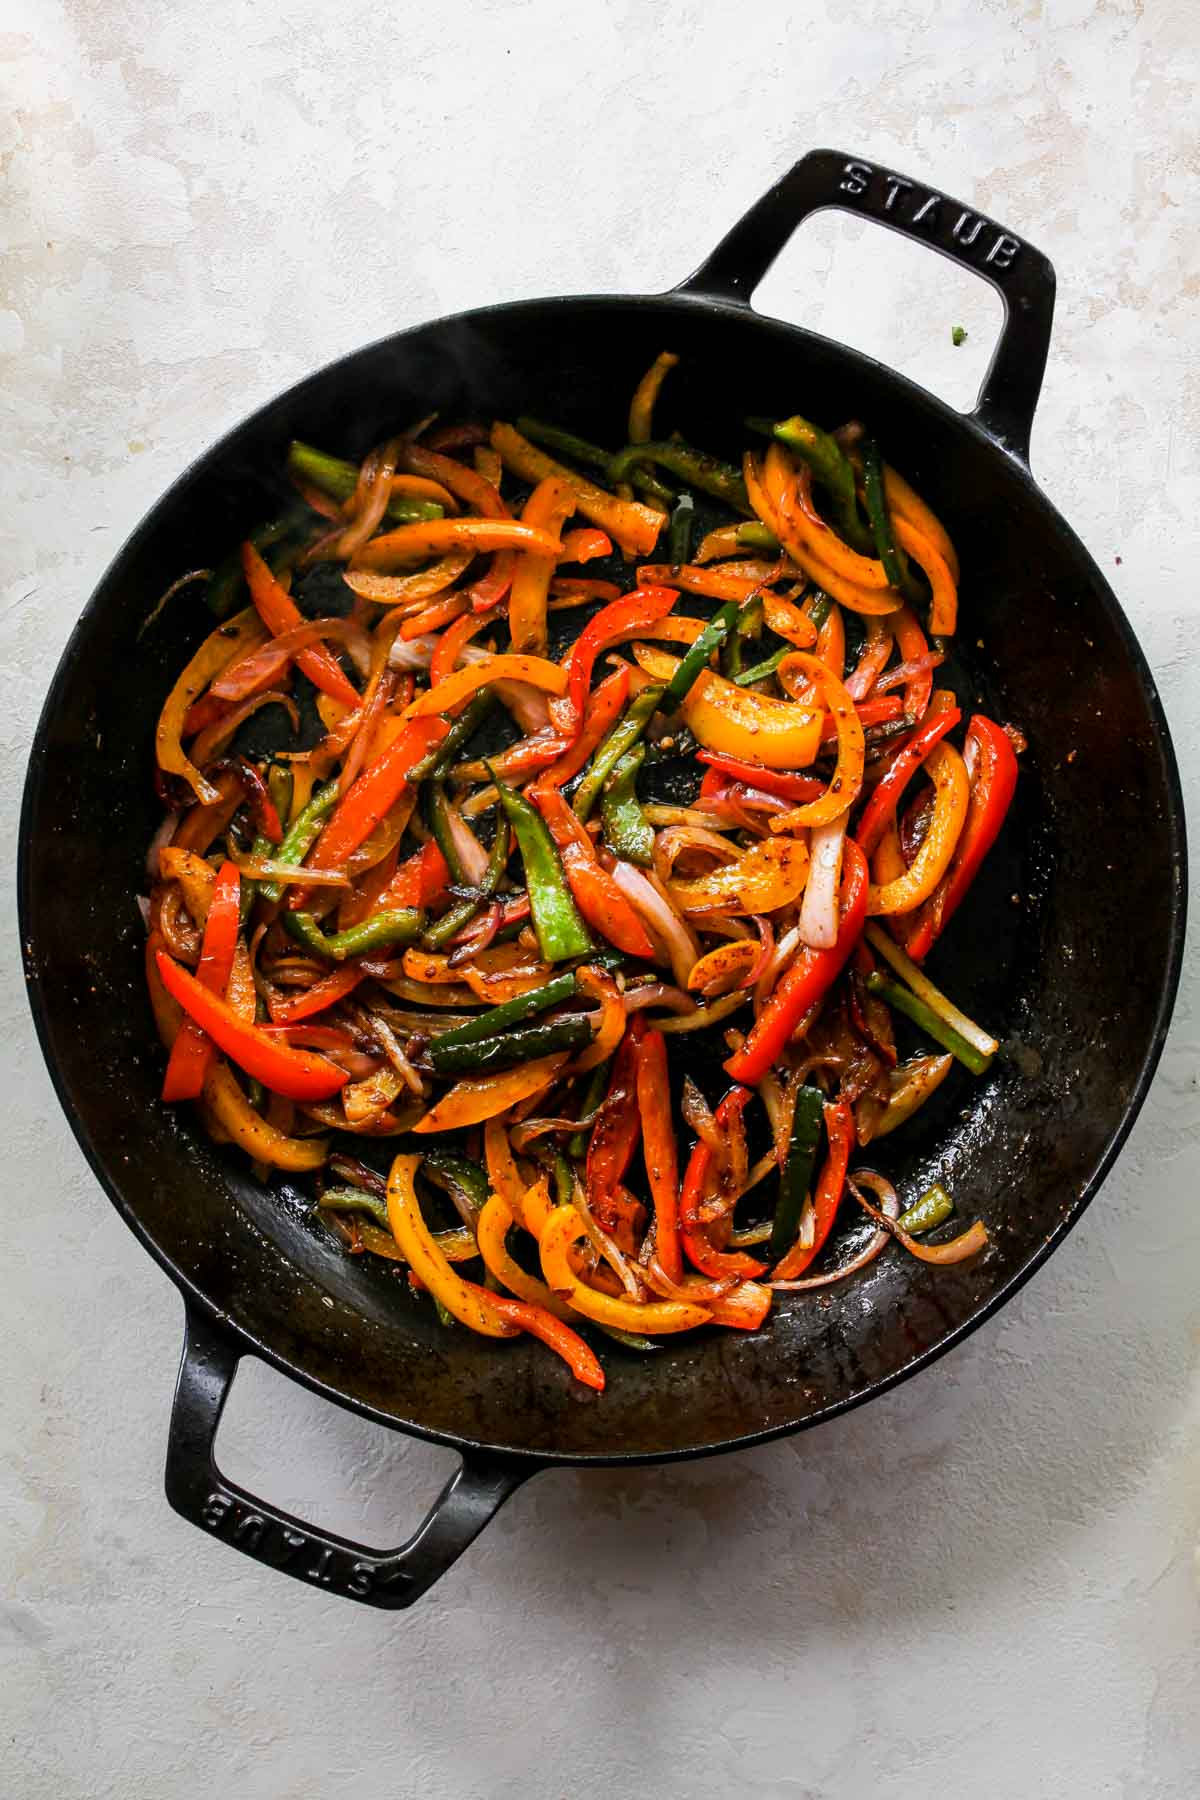 Fajita veggies in a black cast iron skillet